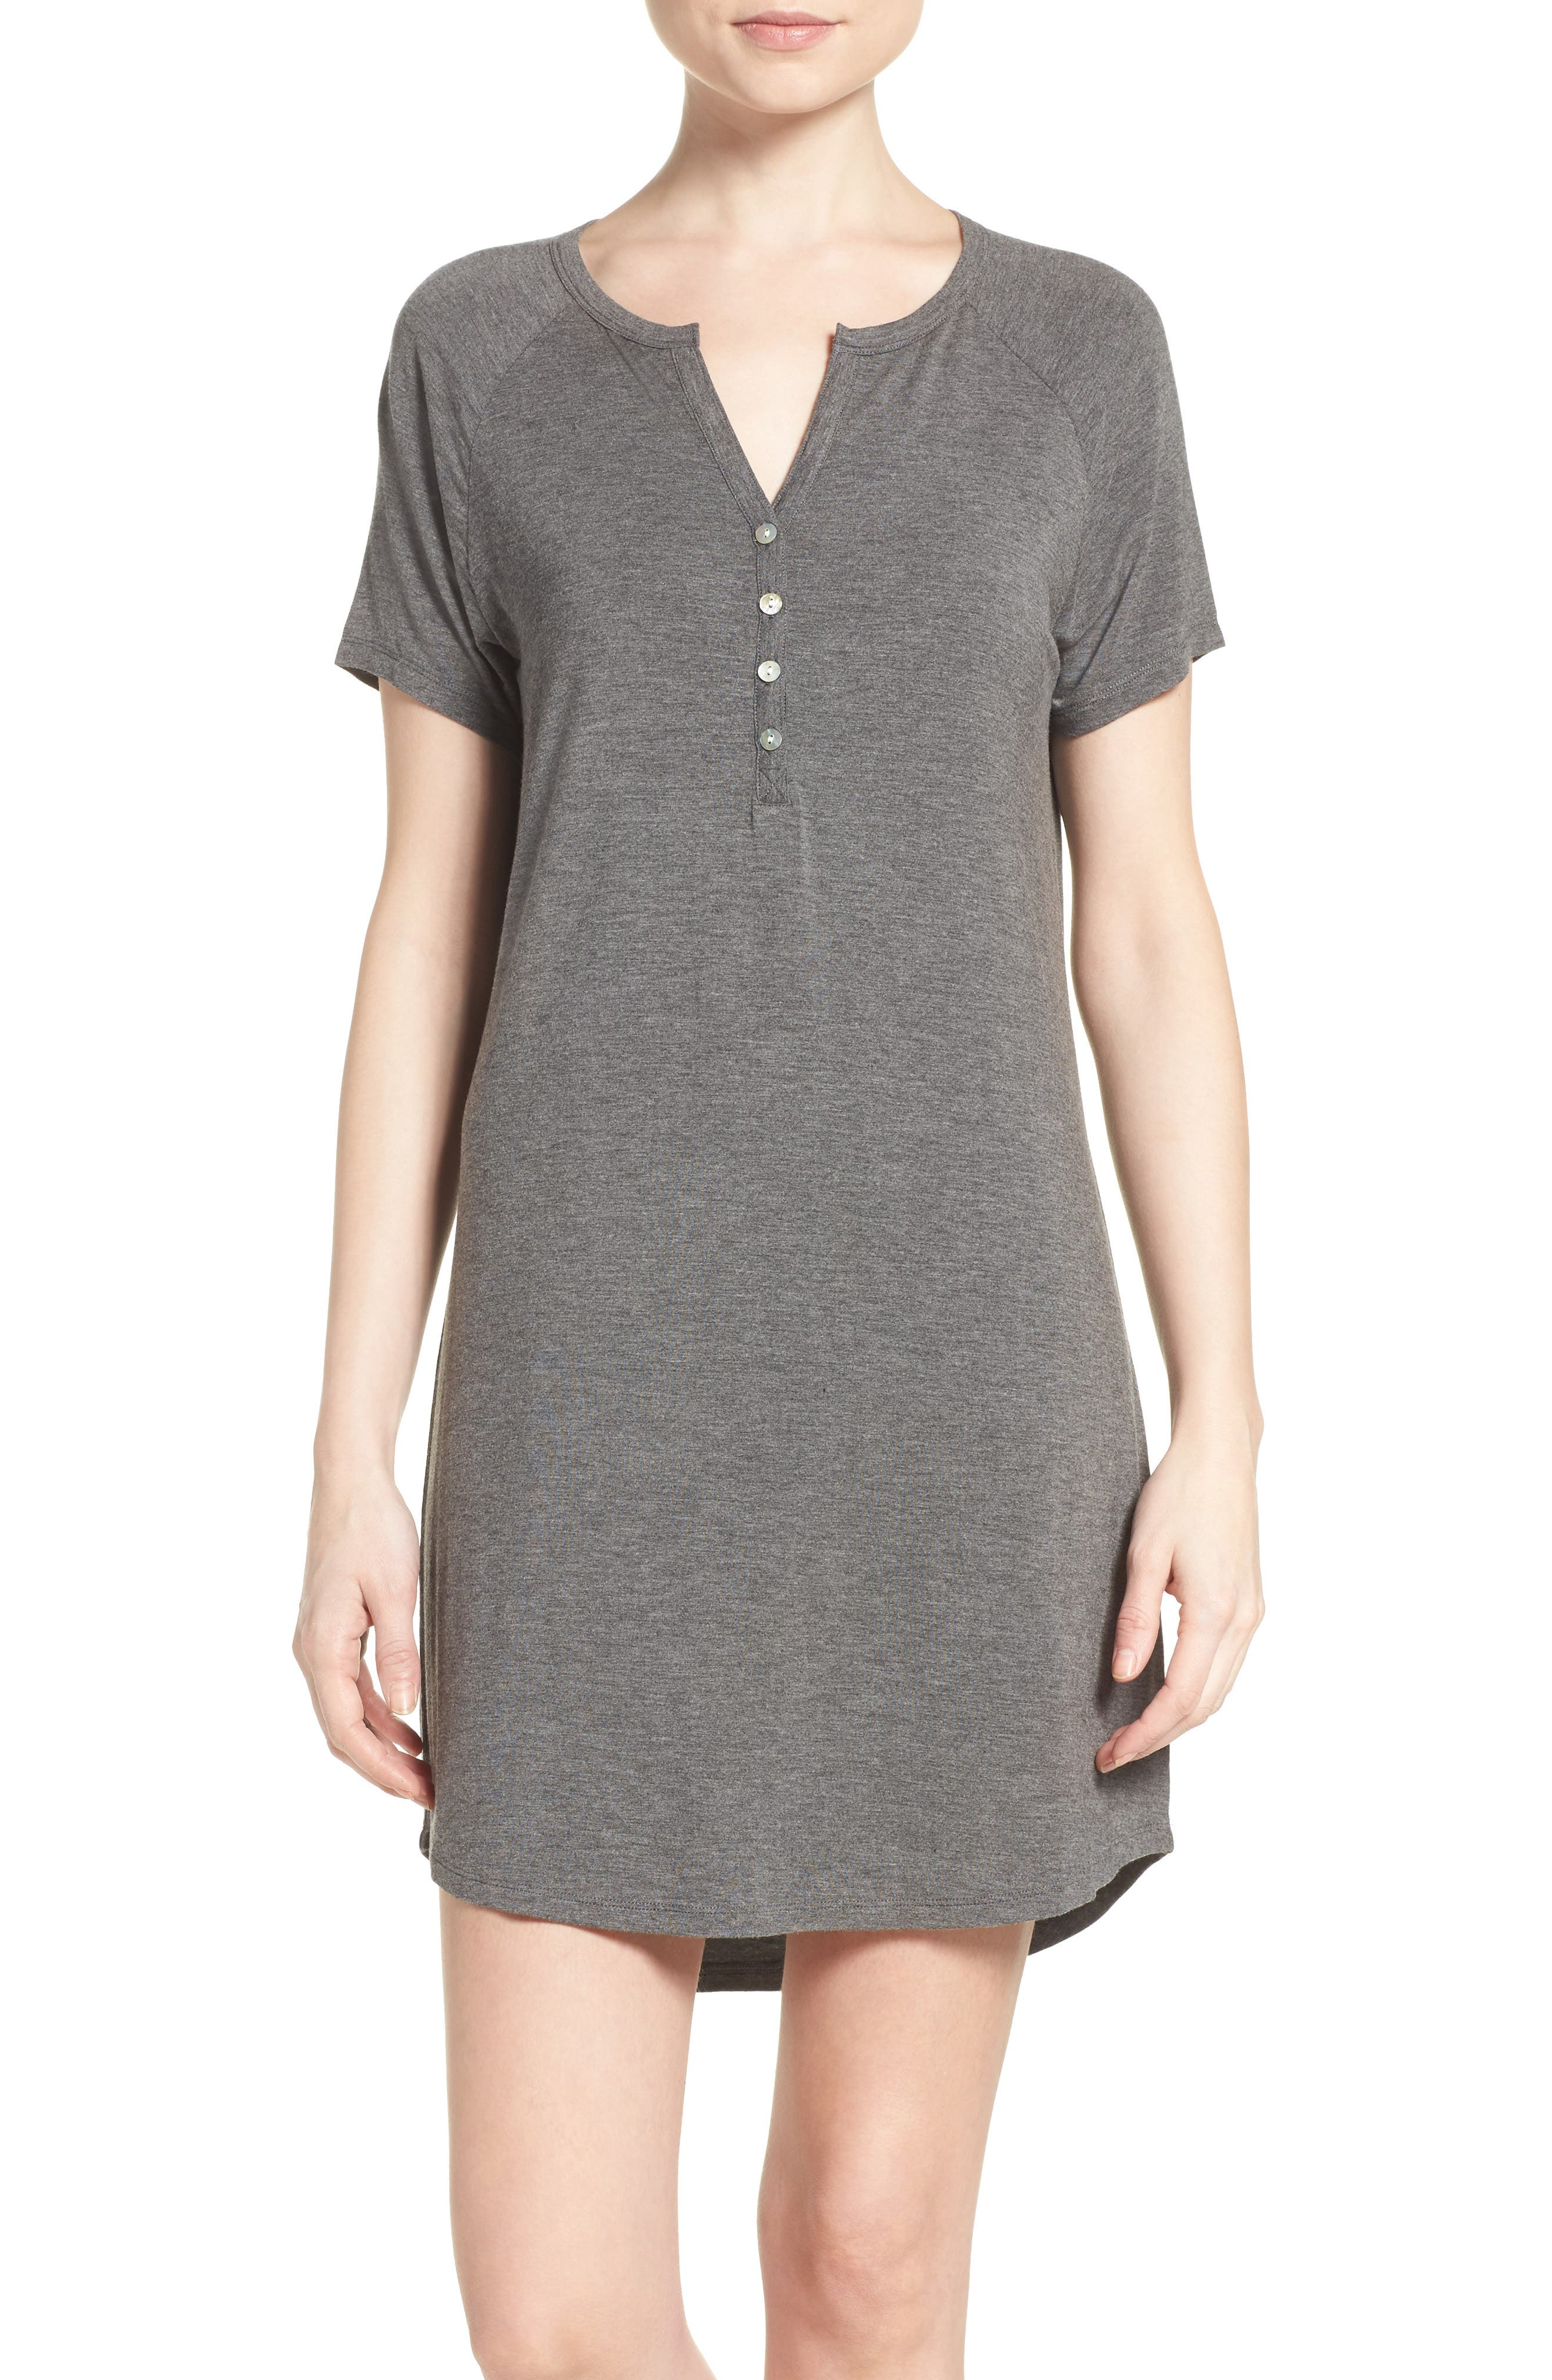 Pj Salvage Sleep Shirt, Grey